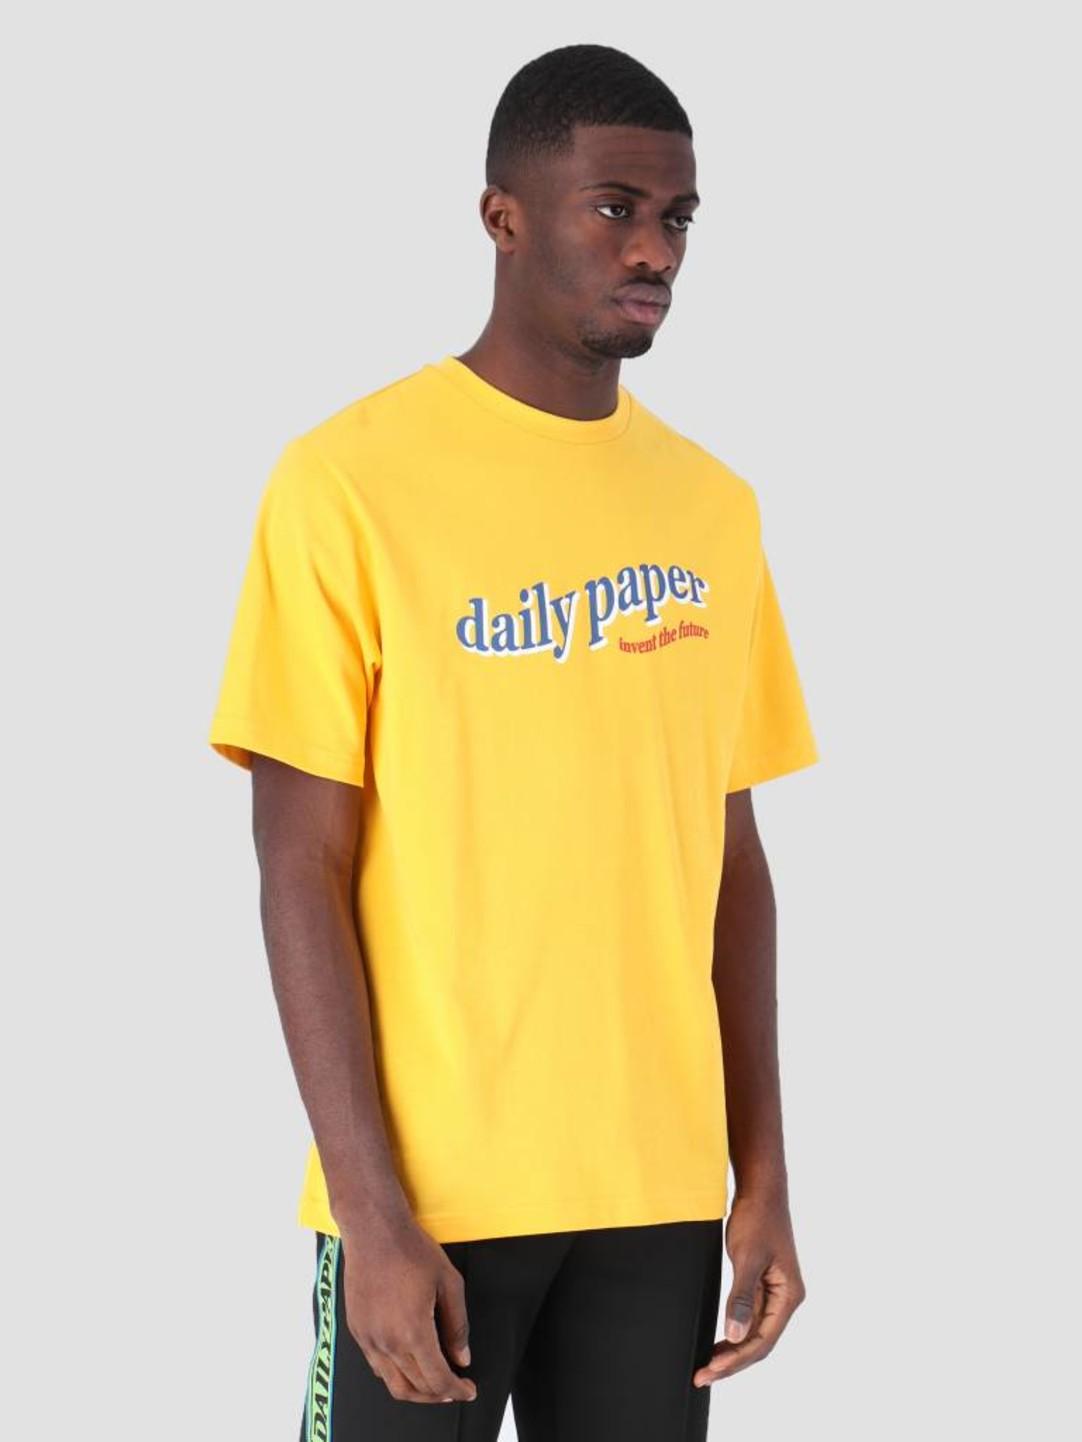 Daily Paper Daily Paper Fellen T-Shirt Yellow 19S1TS13-01